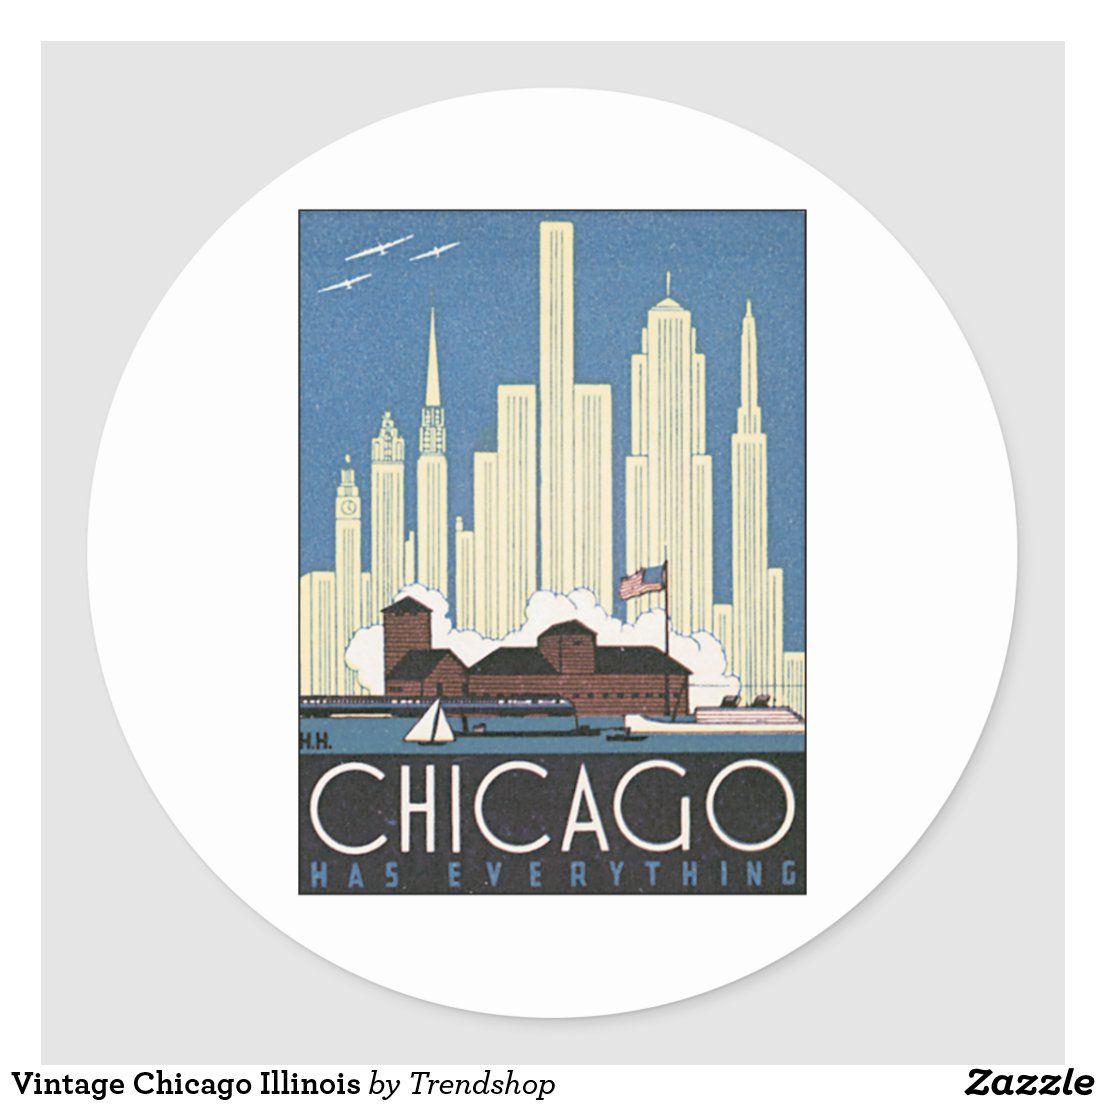 Vintage Chicago Illinois Classic Round Sticker Zazzle Com Chicago Illinois Retro Art Work Stickers [ 1106 x 1106 Pixel ]